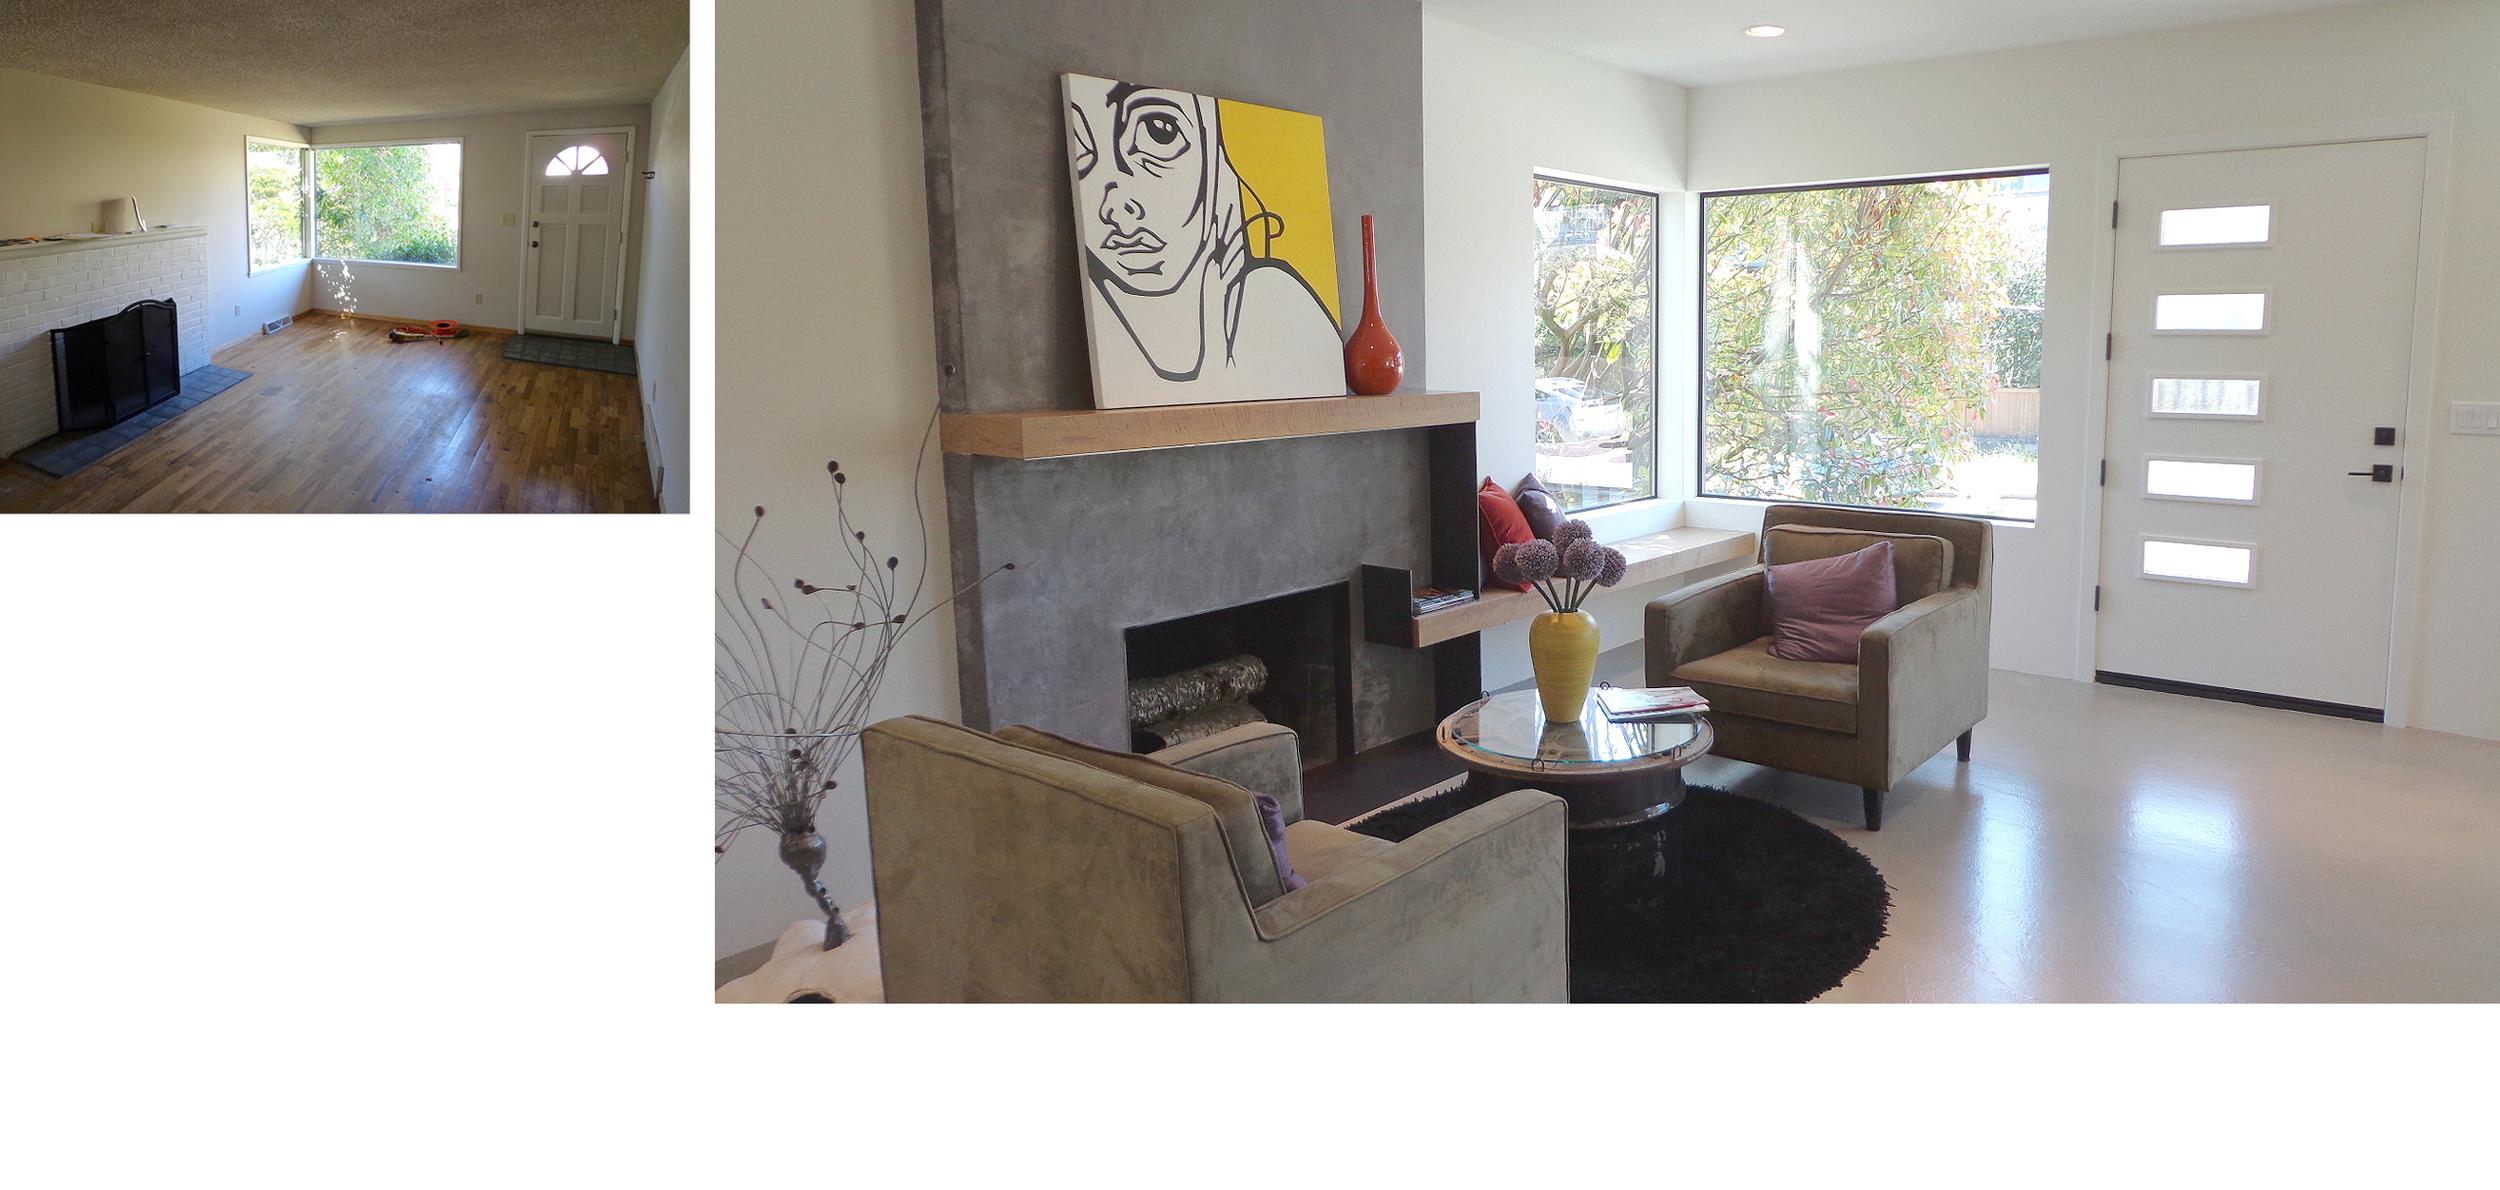 Original Fireplace Transformation